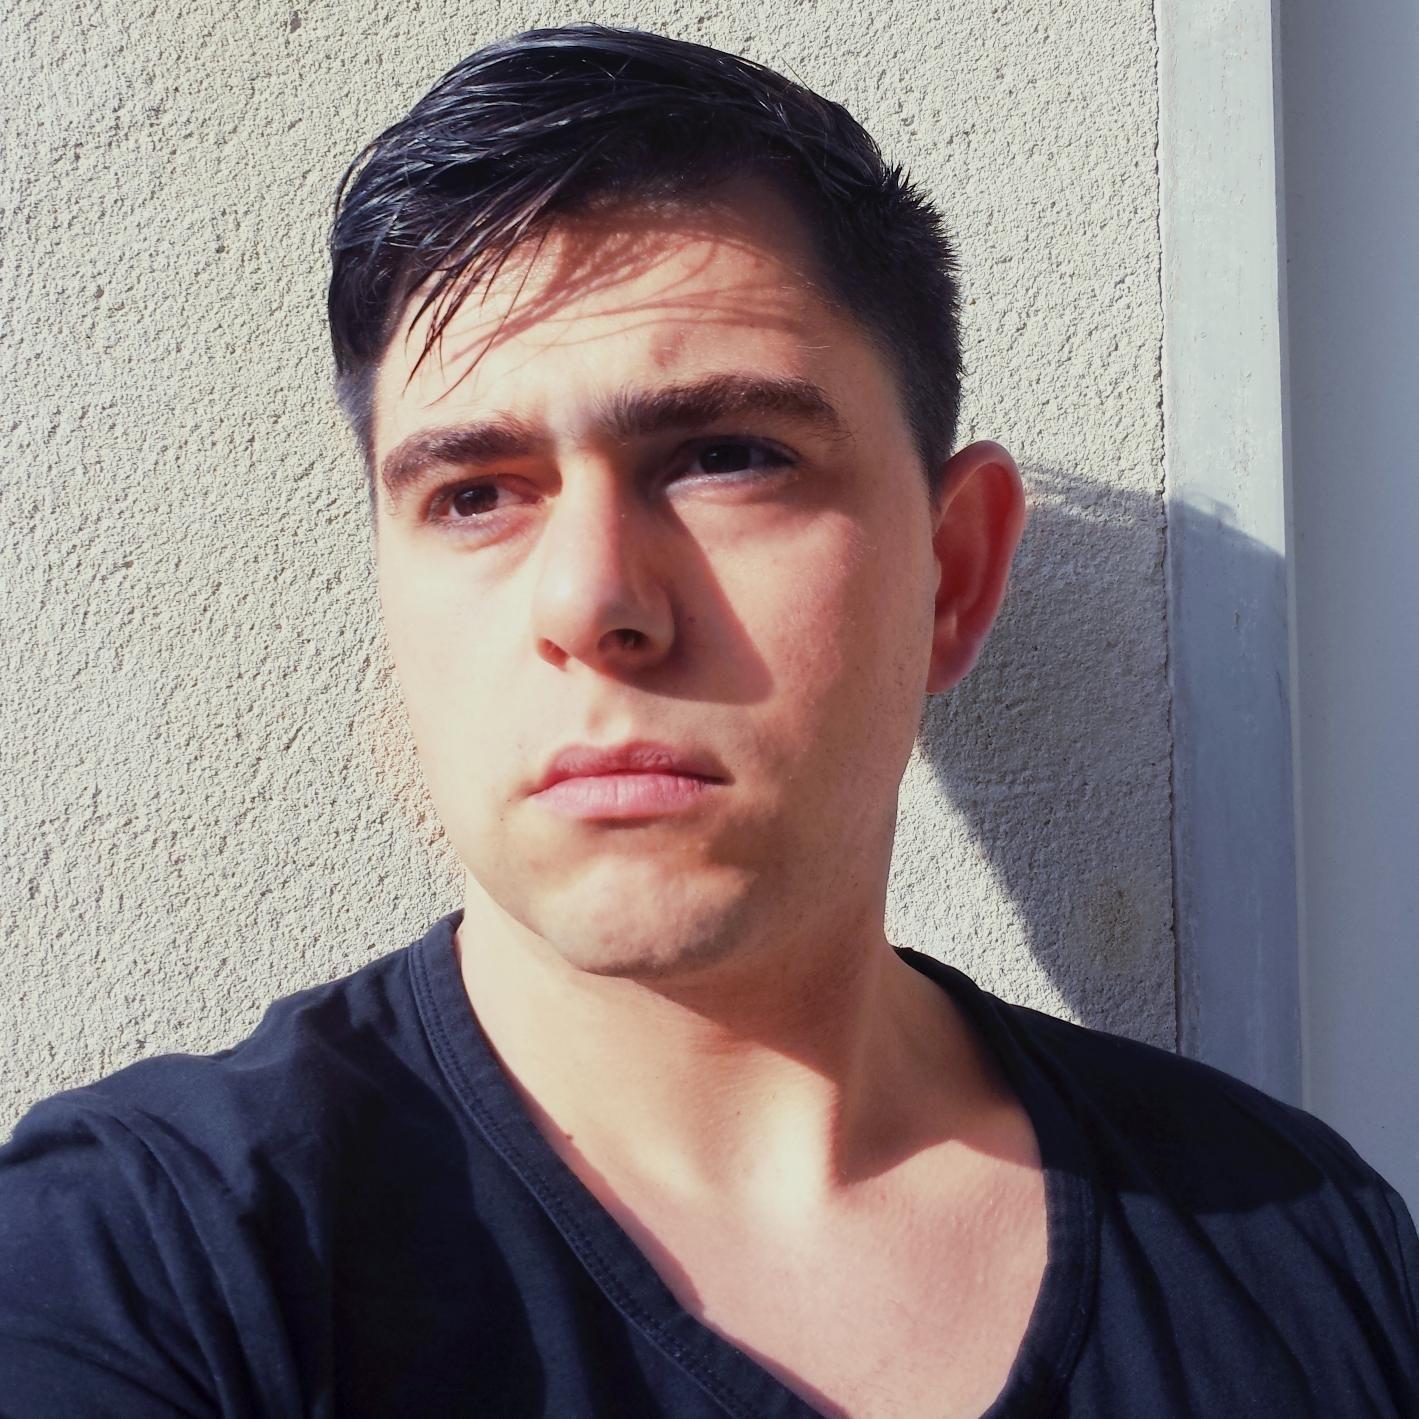 Sebastien Allemand